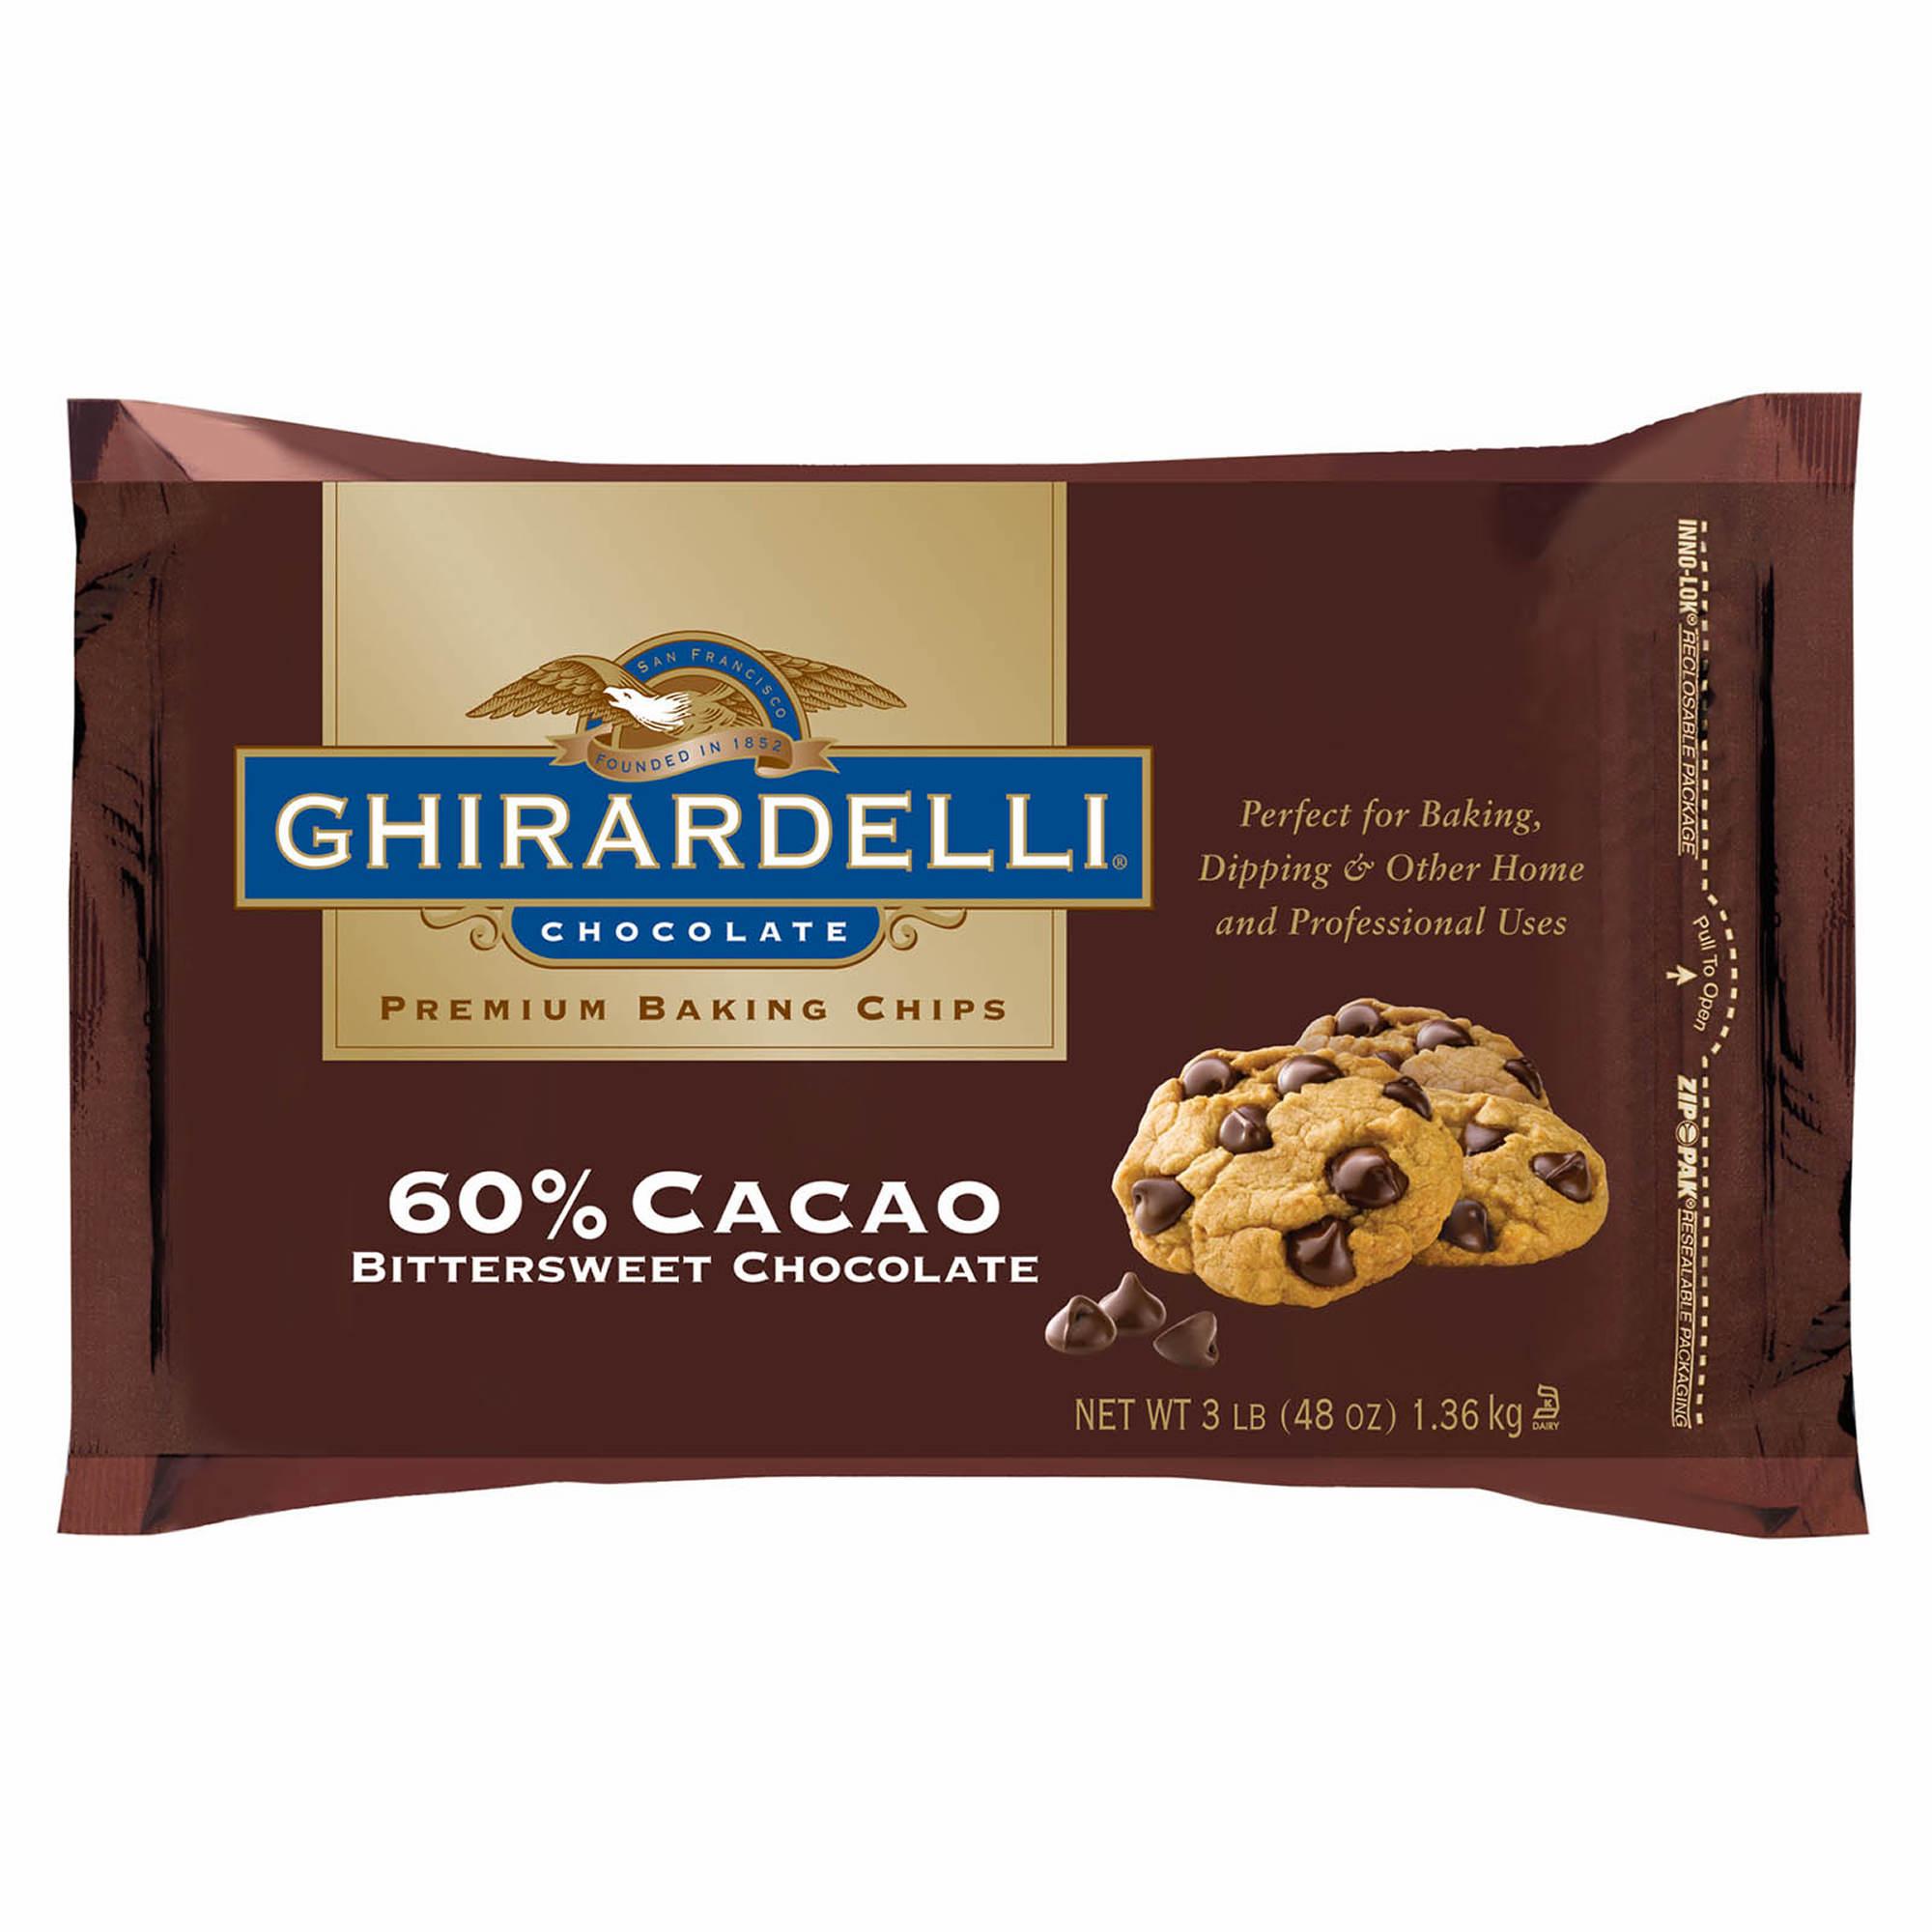 Ghirardelli Baking Chocolate Nutritional Information